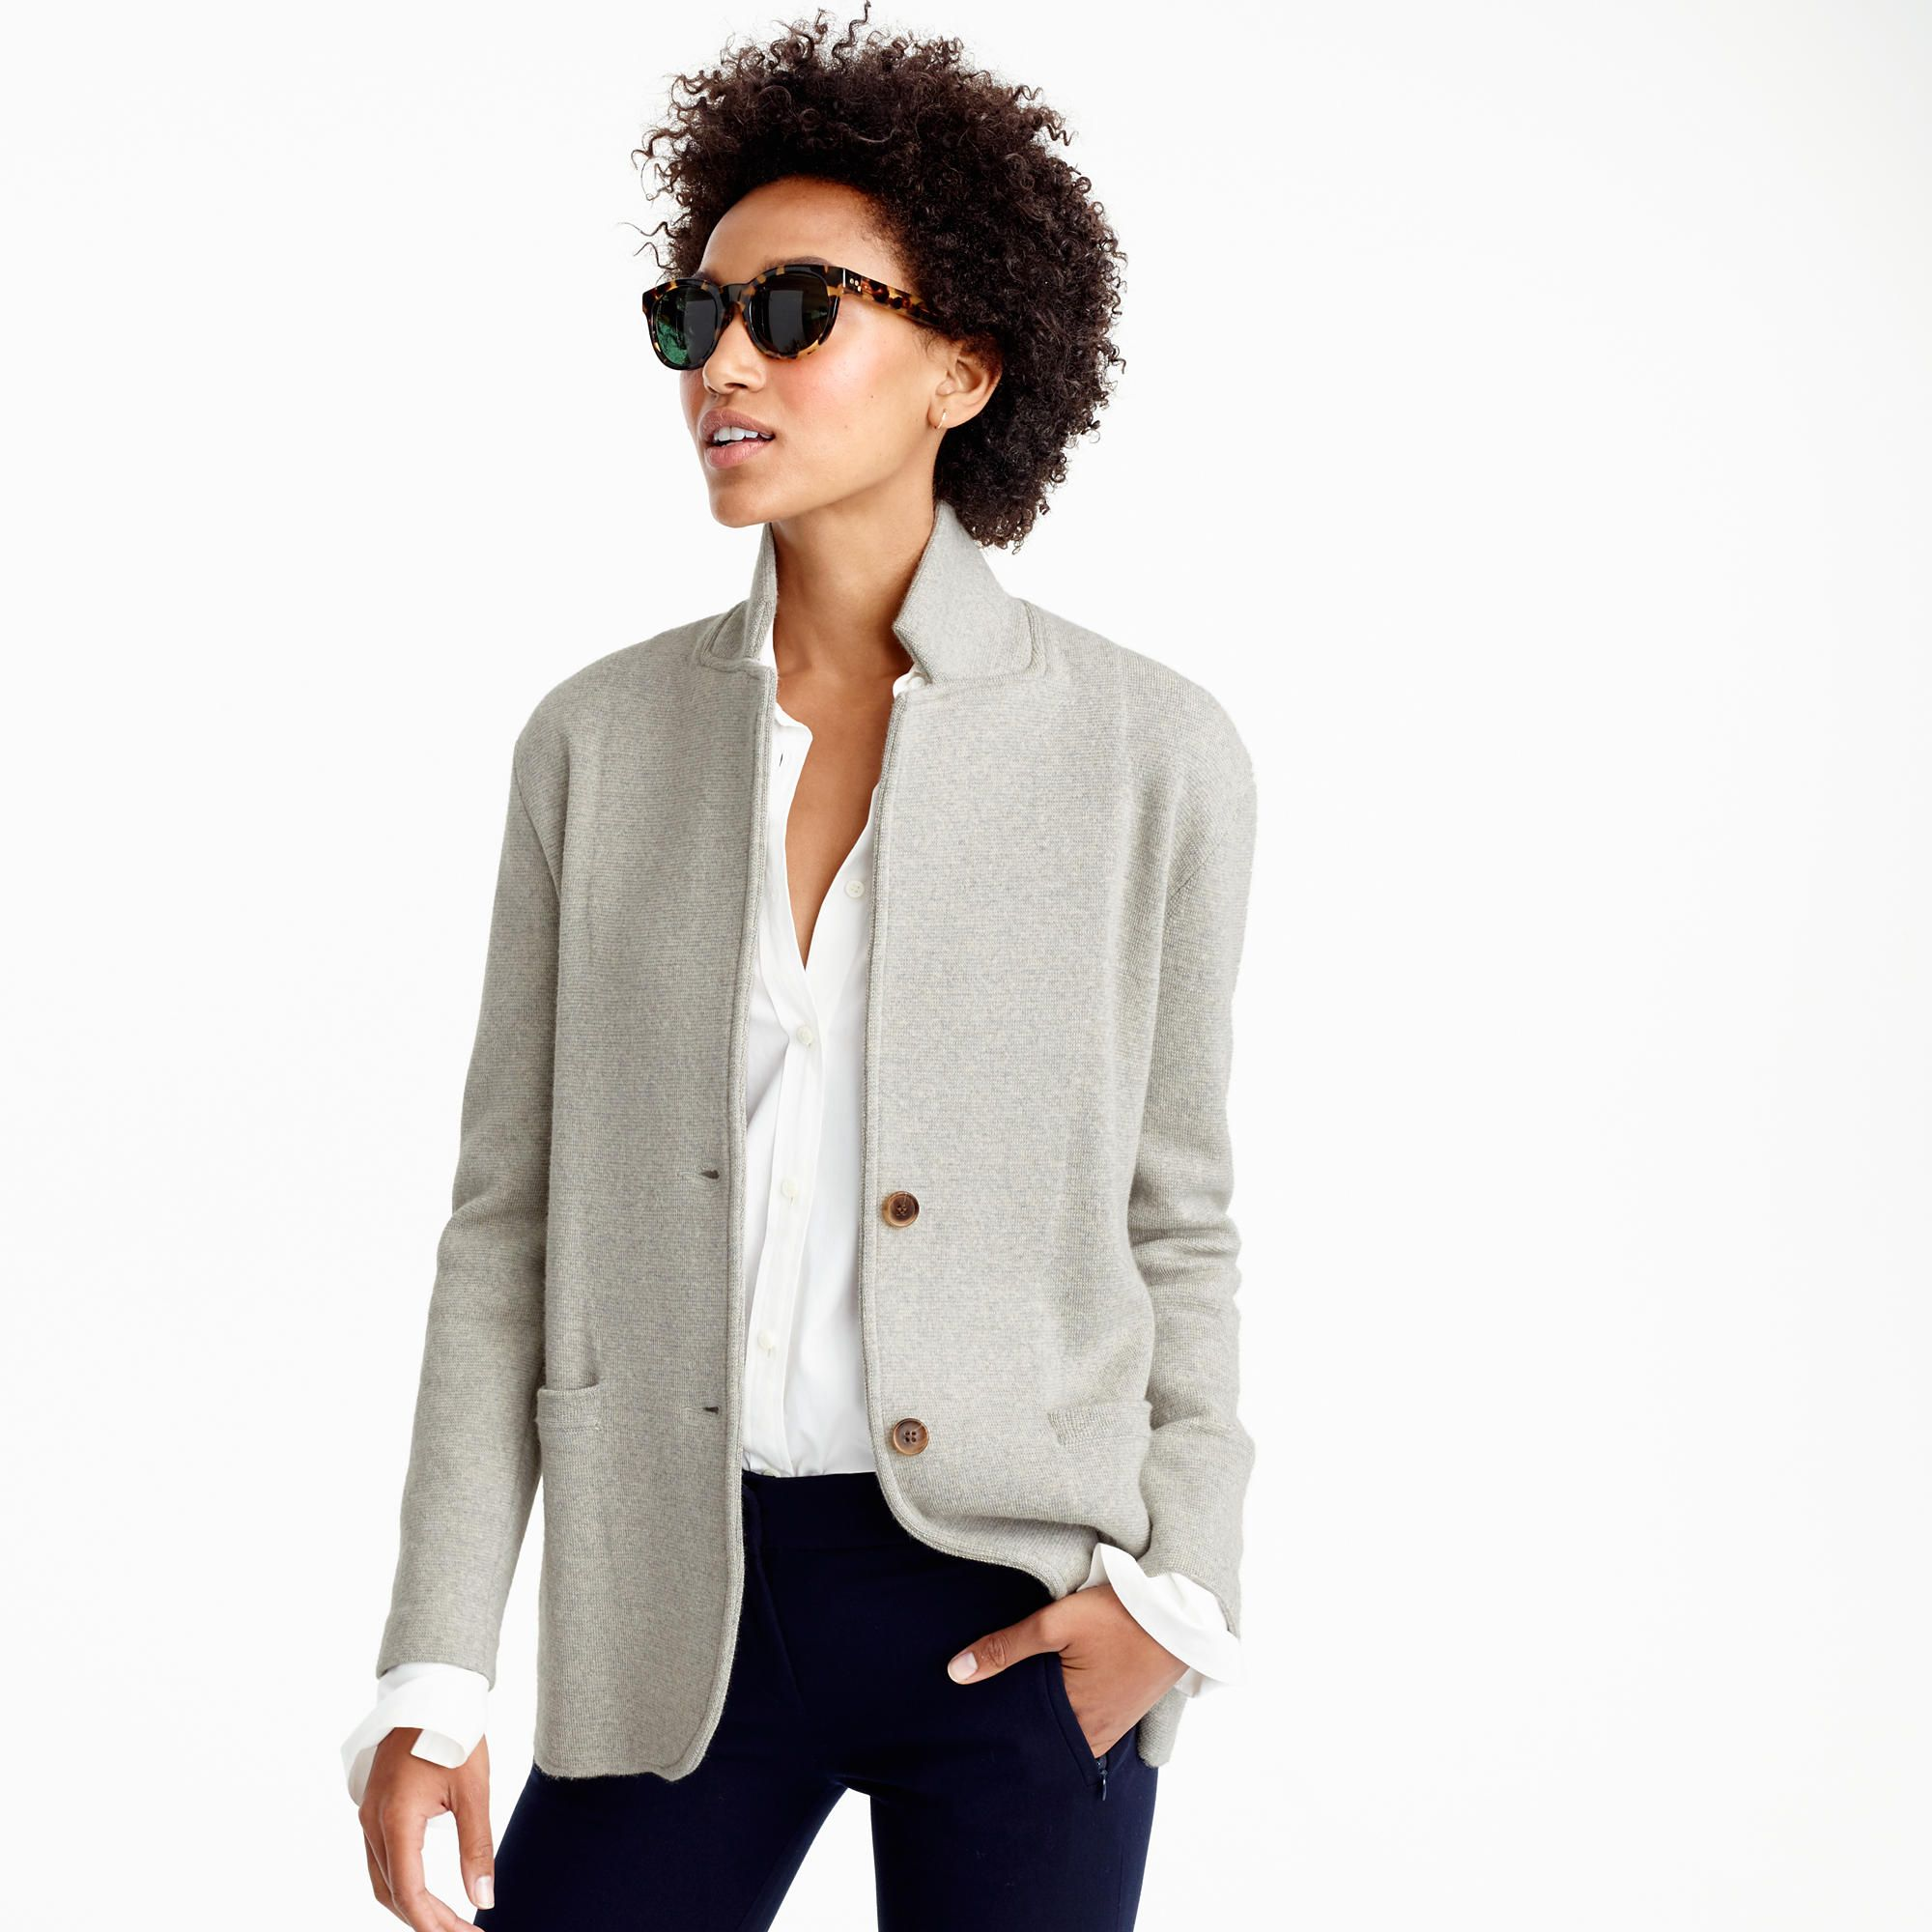 Merino wool sweater-blazer : Cardigans & Shells | J.Crew | My ...